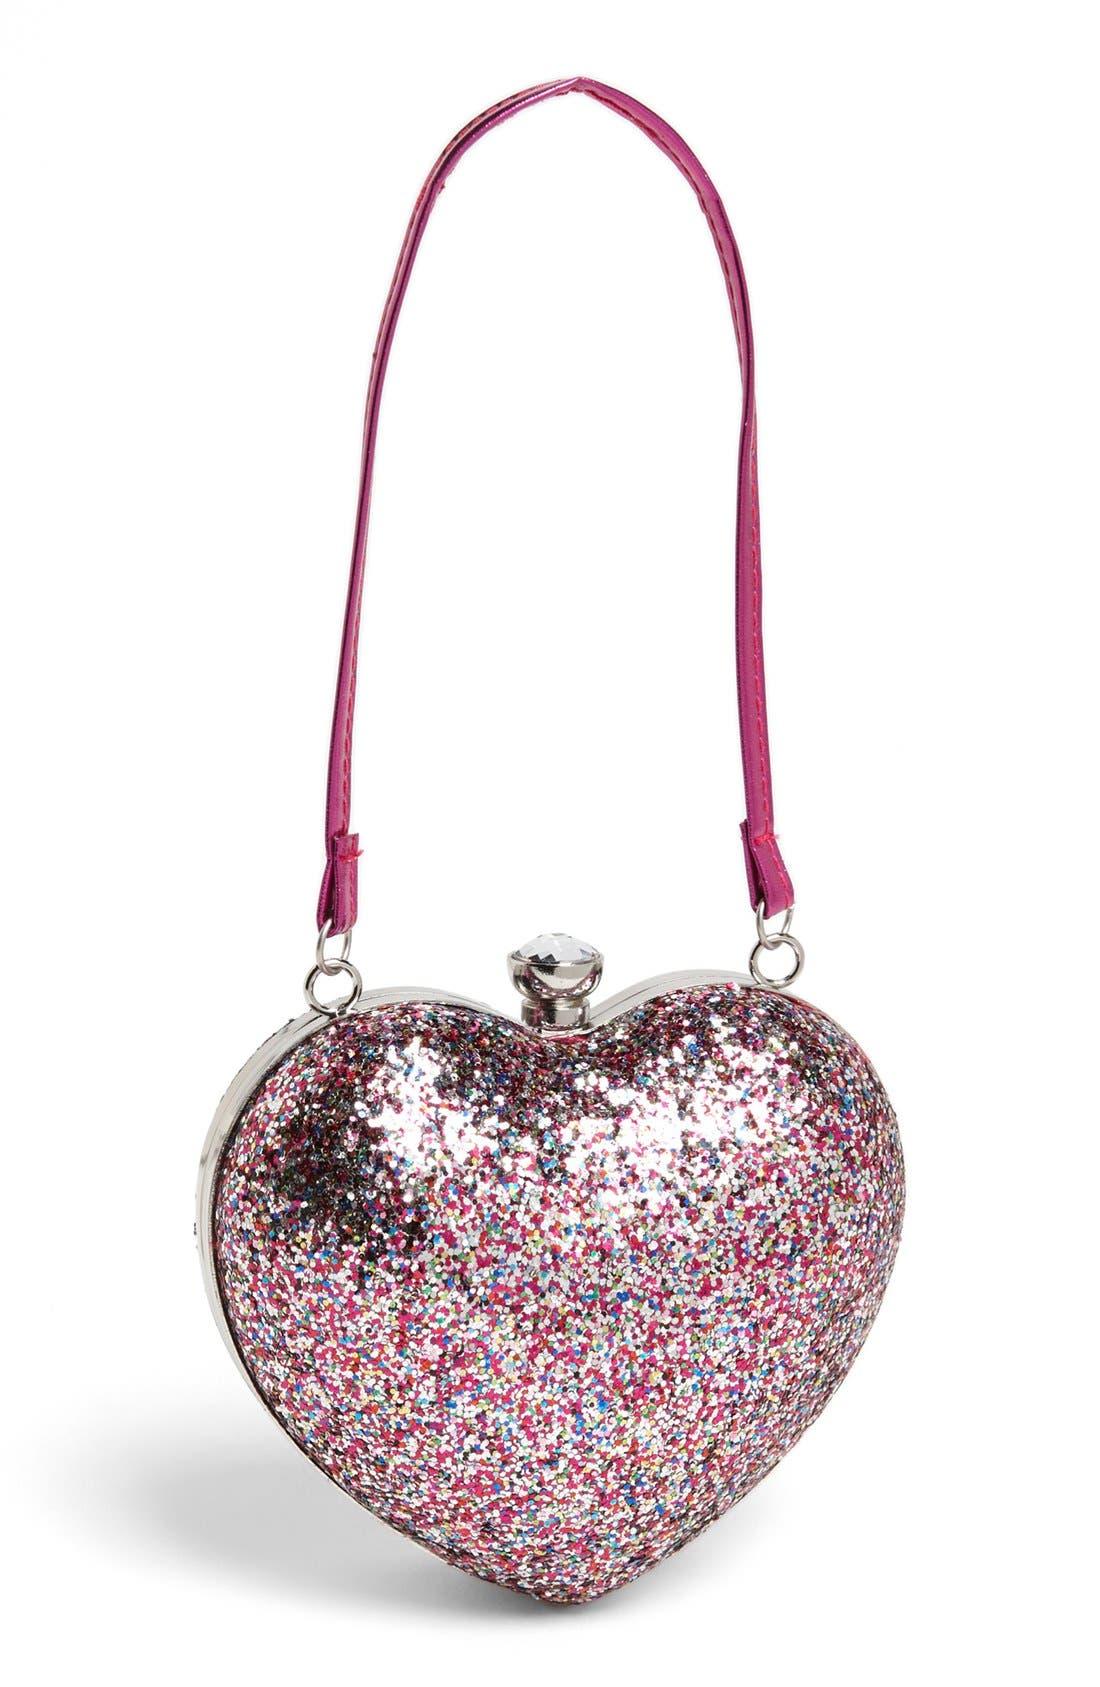 Capelli of New York Glitter Heart Shaped Handbag, Main, color, 975